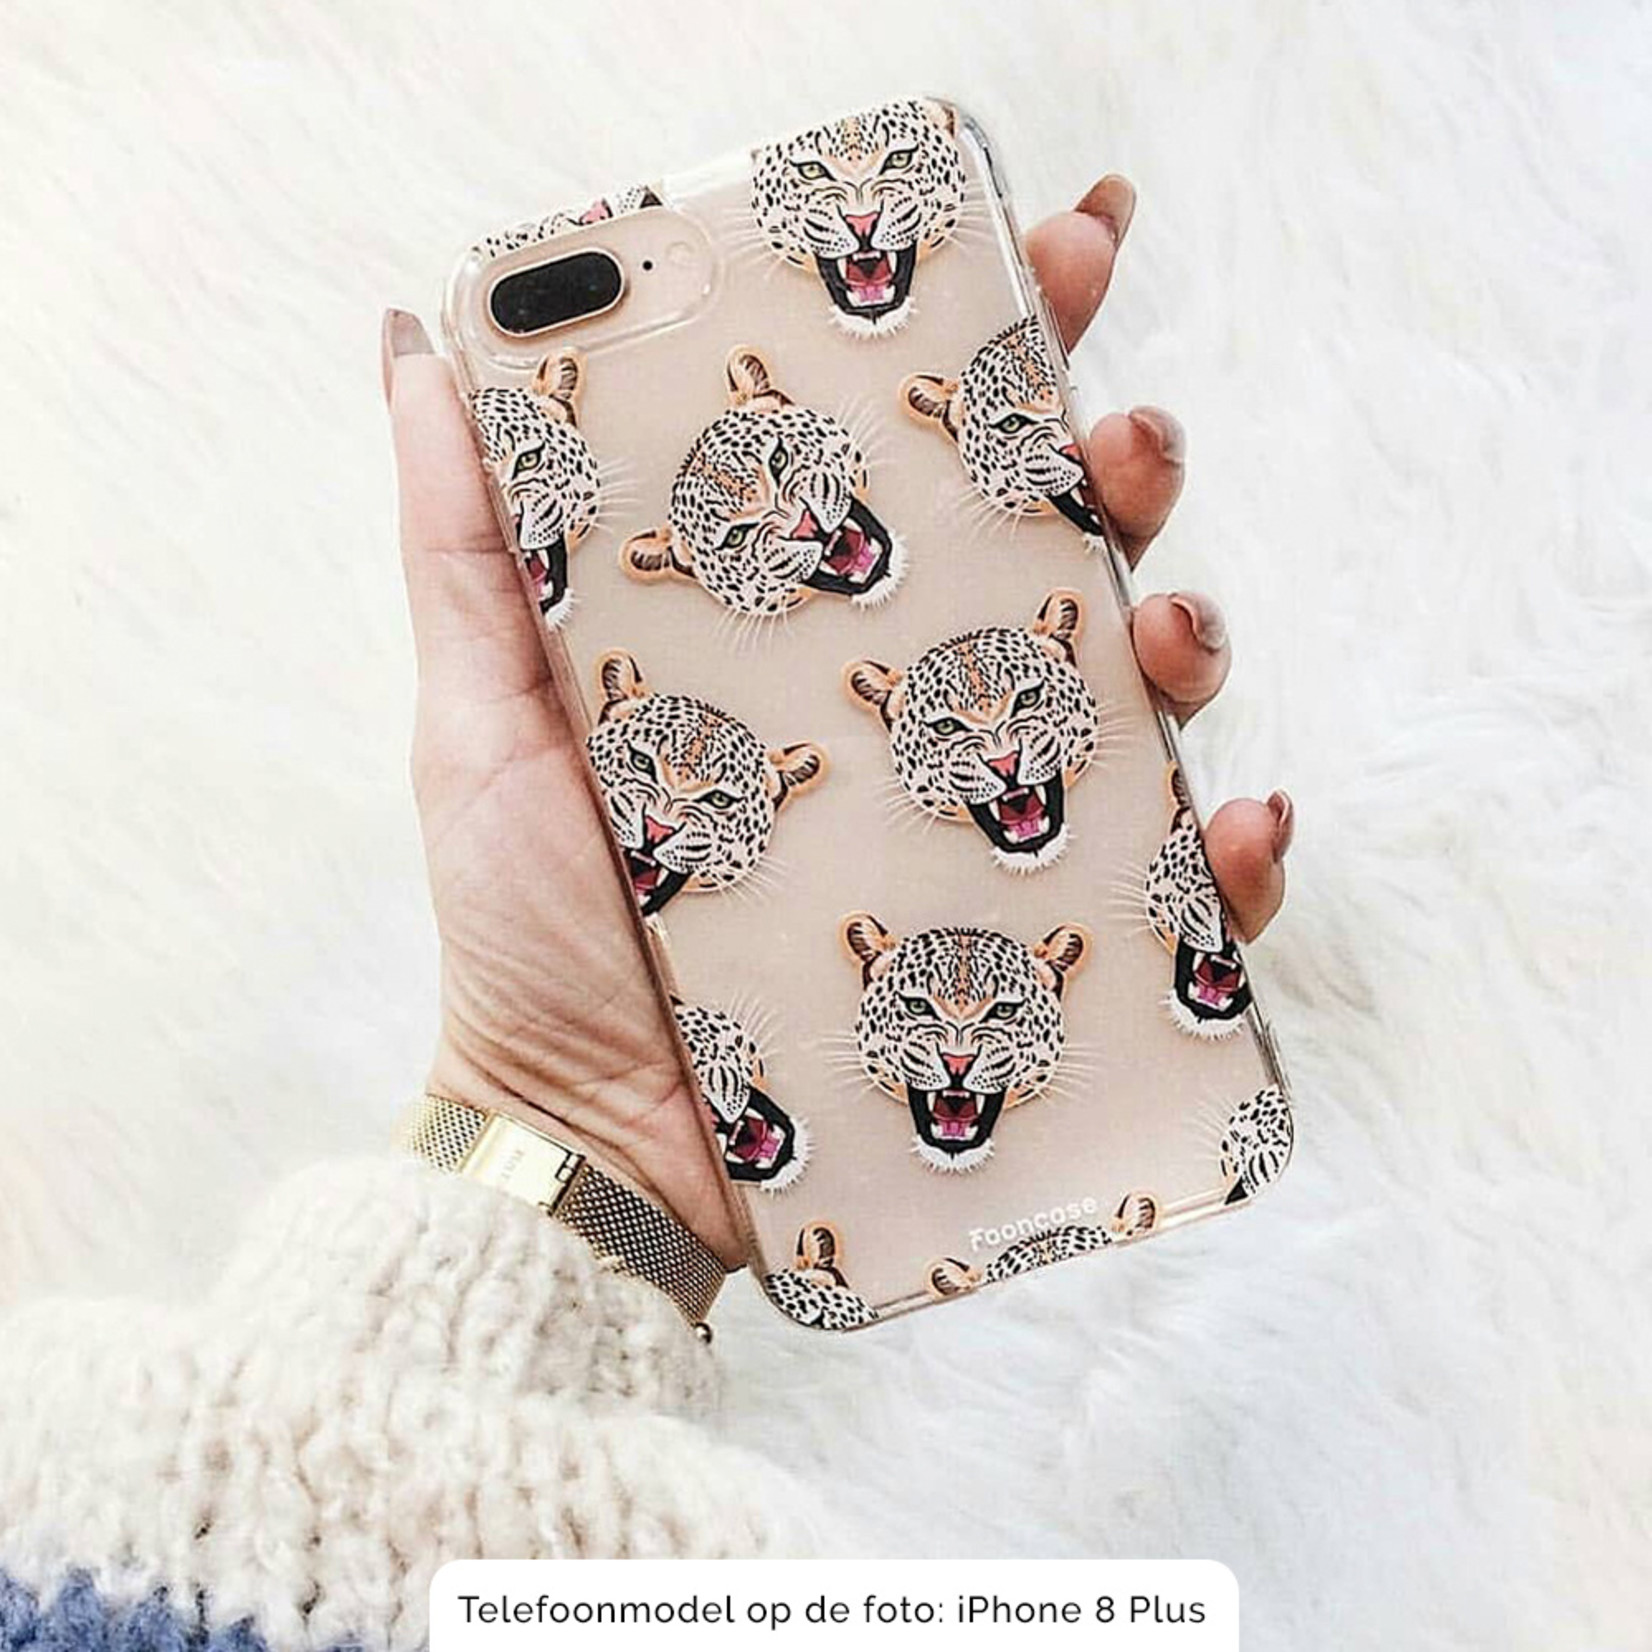 FOONCASE Samsung Galaxy J3 2016 hoesje TPU Soft Case - Back Cover - Cheeky Leopard / Luipaard hoofden